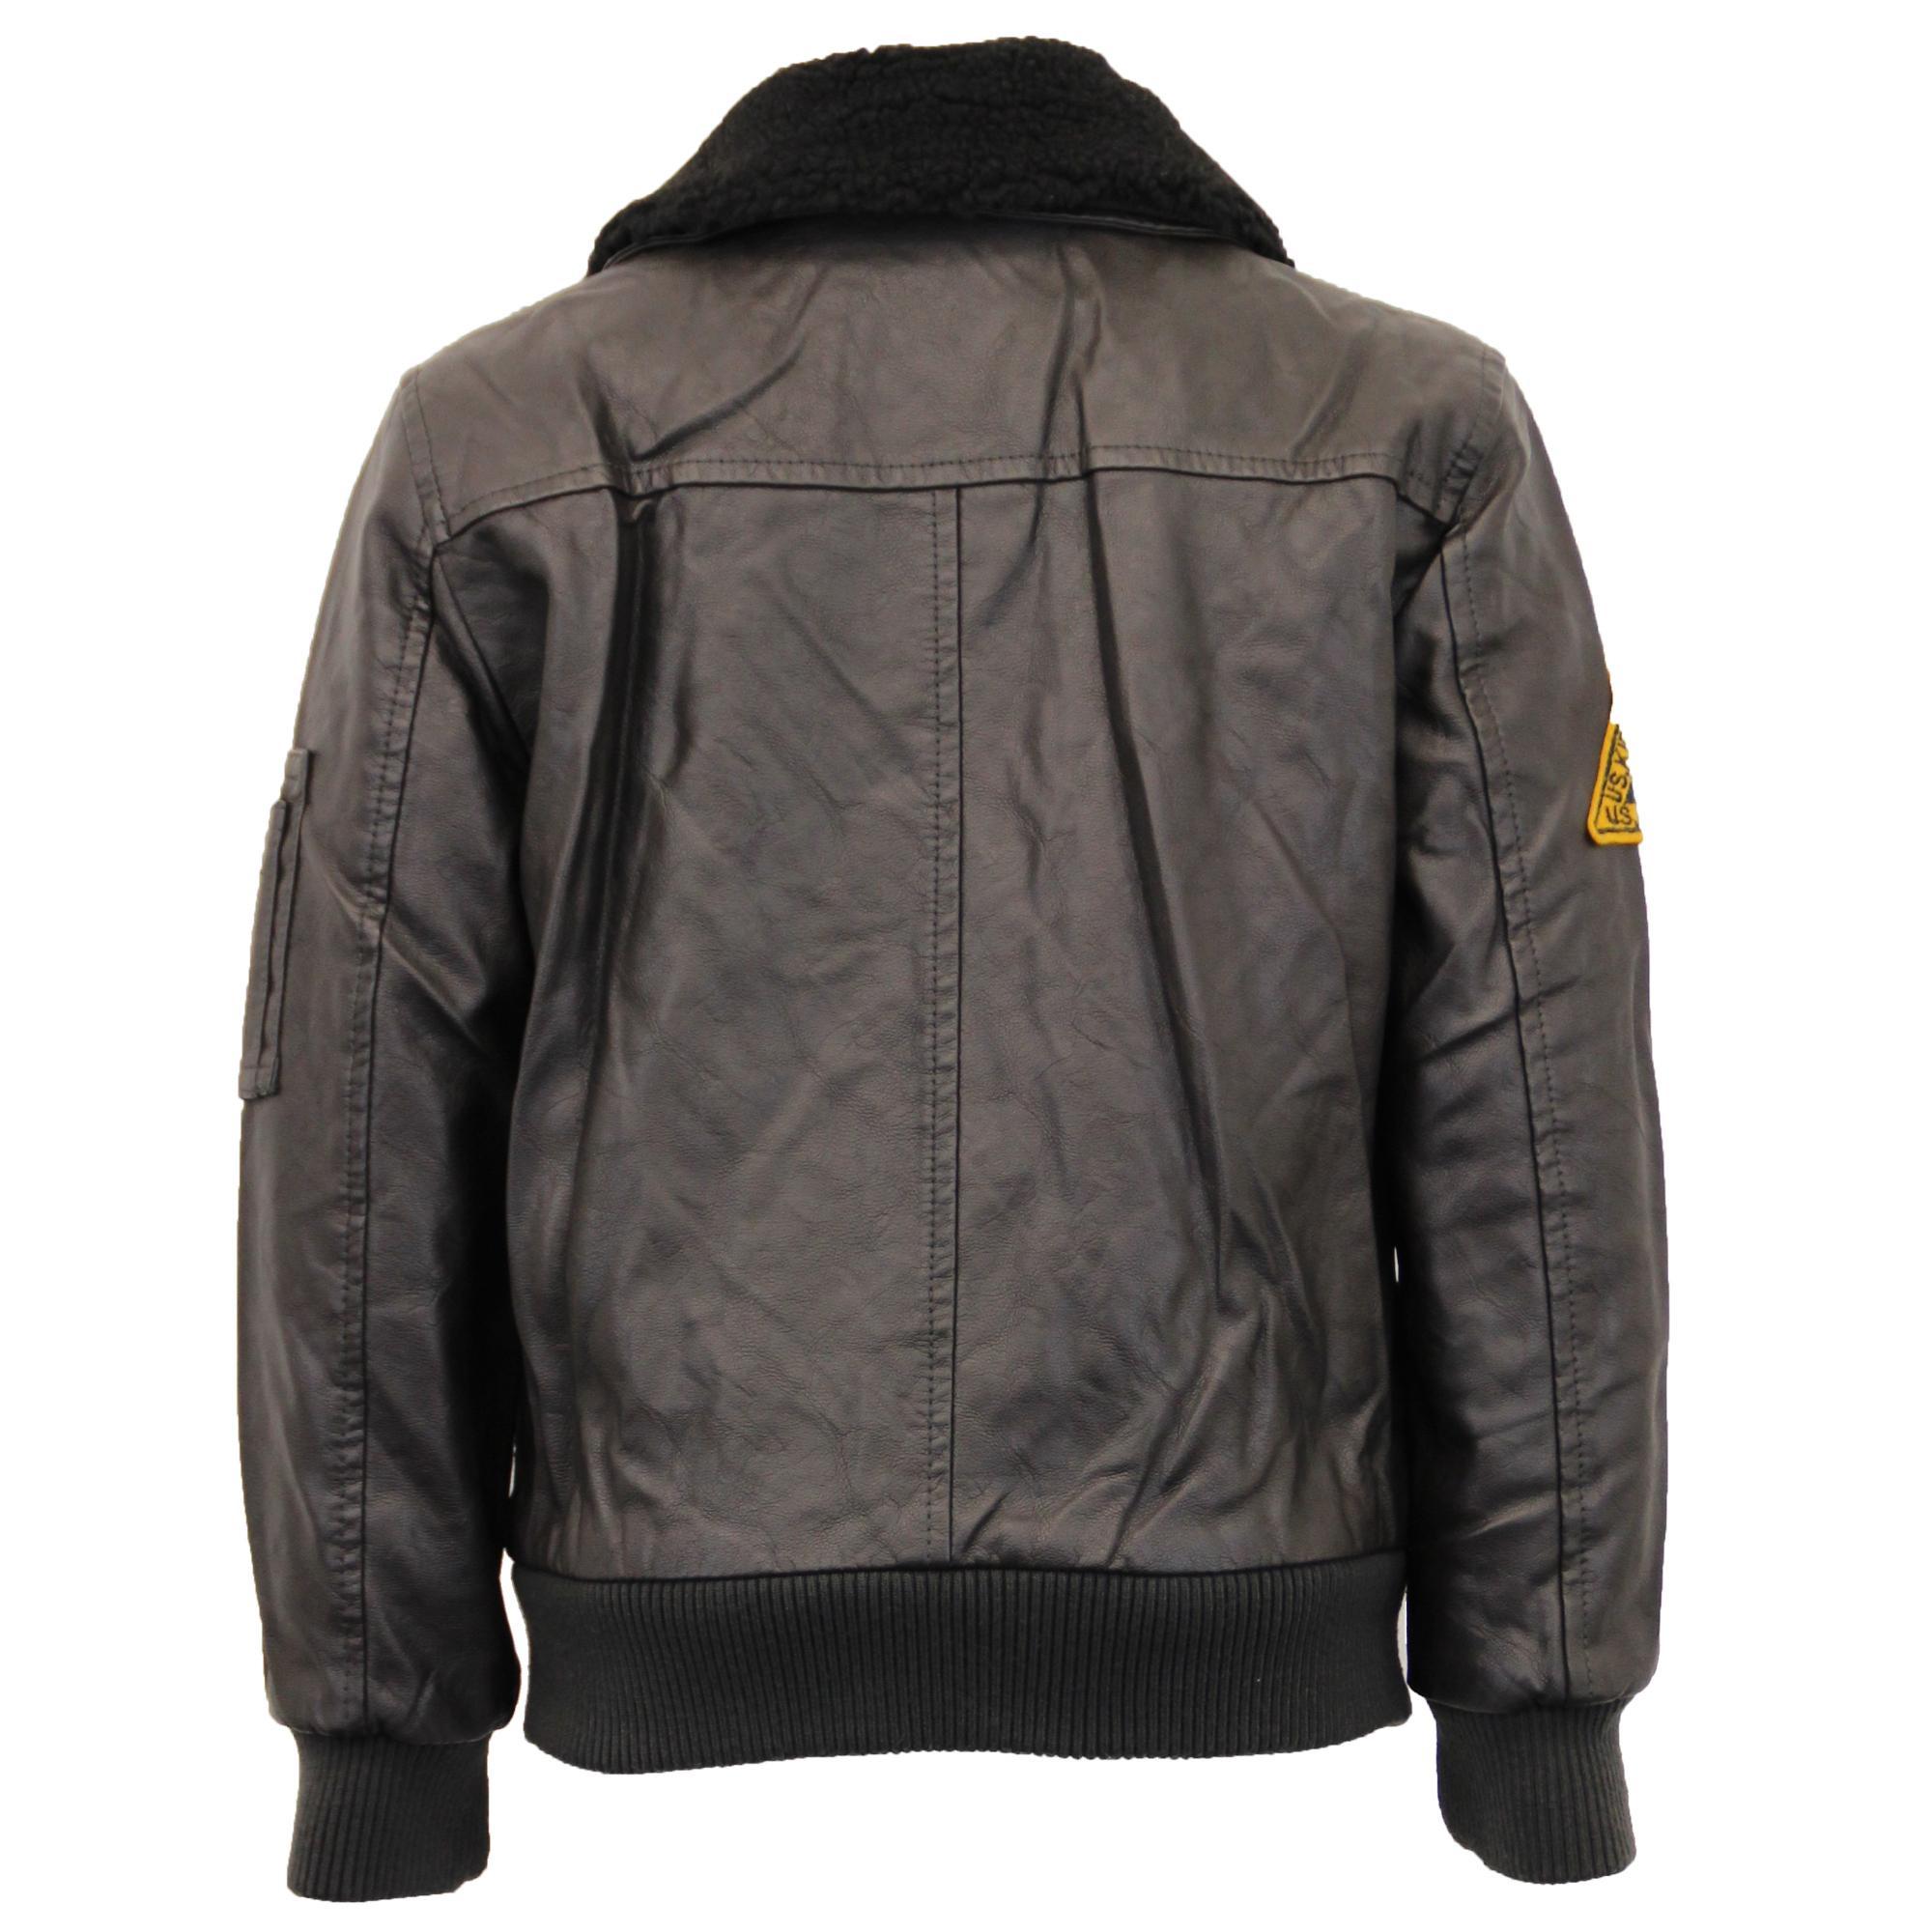 Sherpa leather jacket